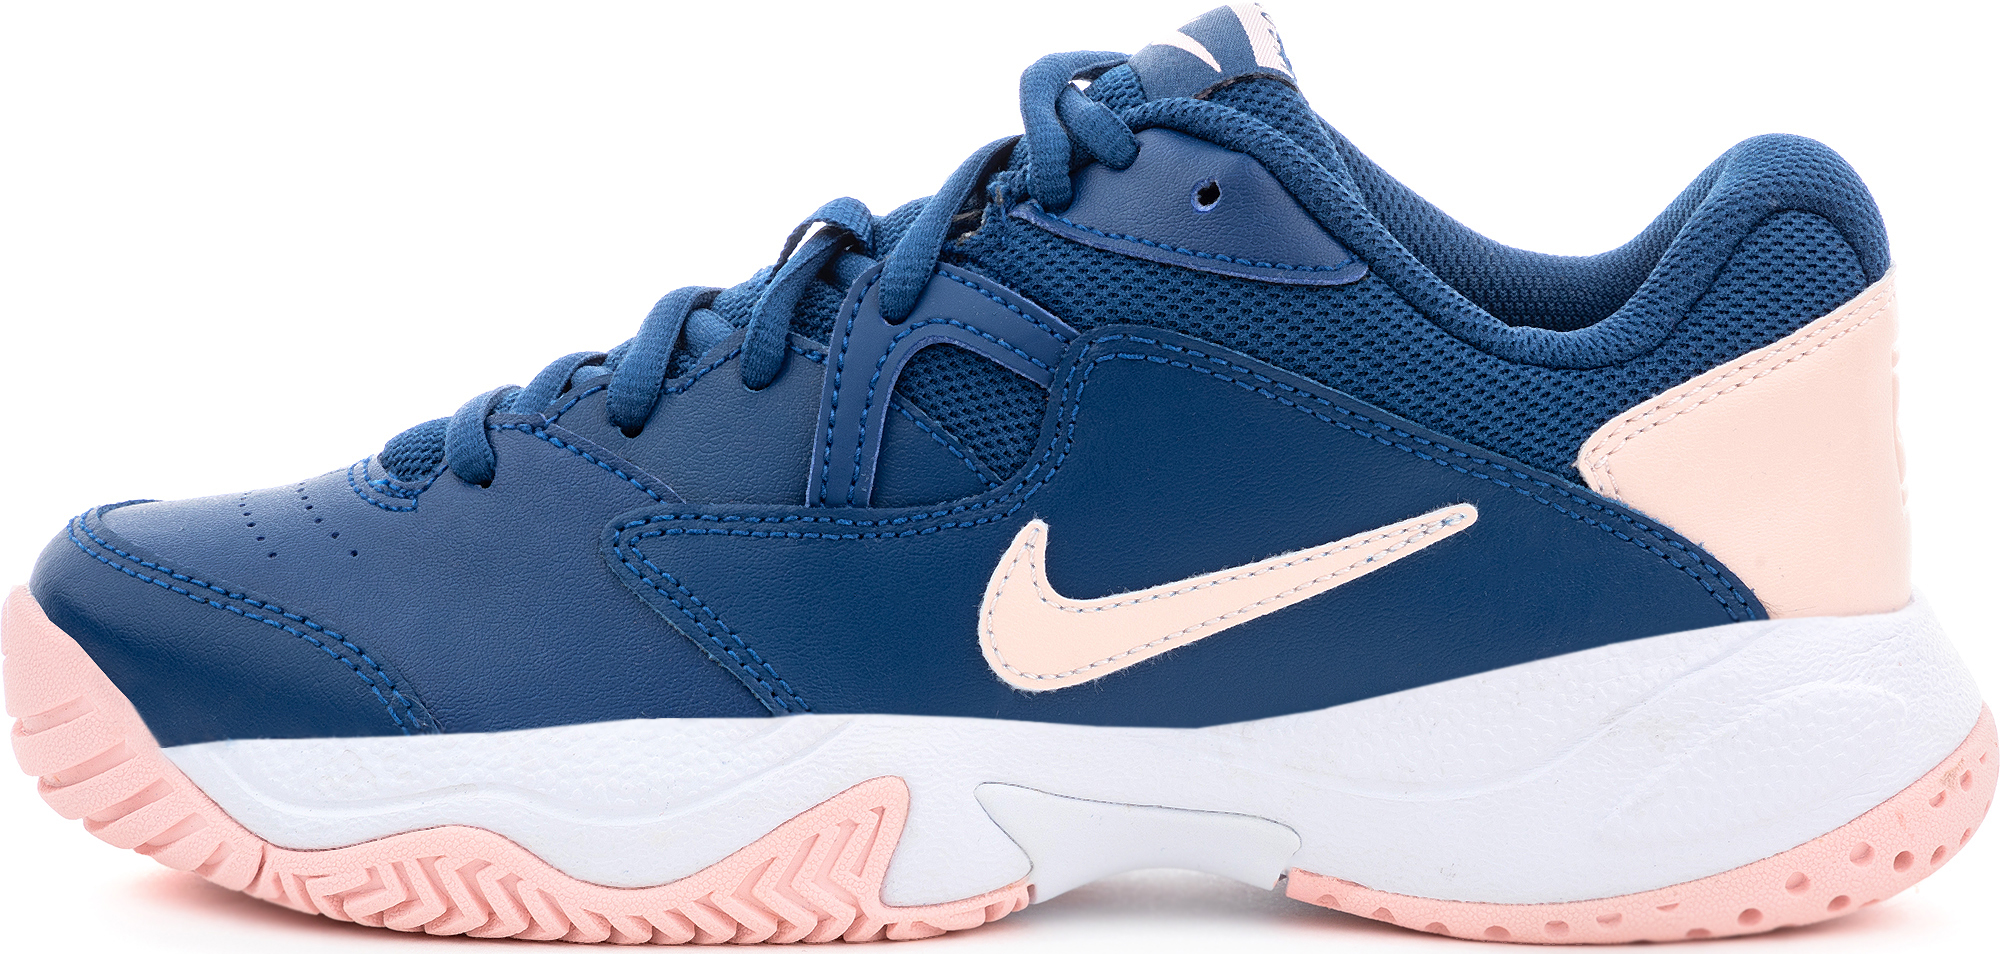 Nike Кроссовки женские Court Lite 2, размер 40